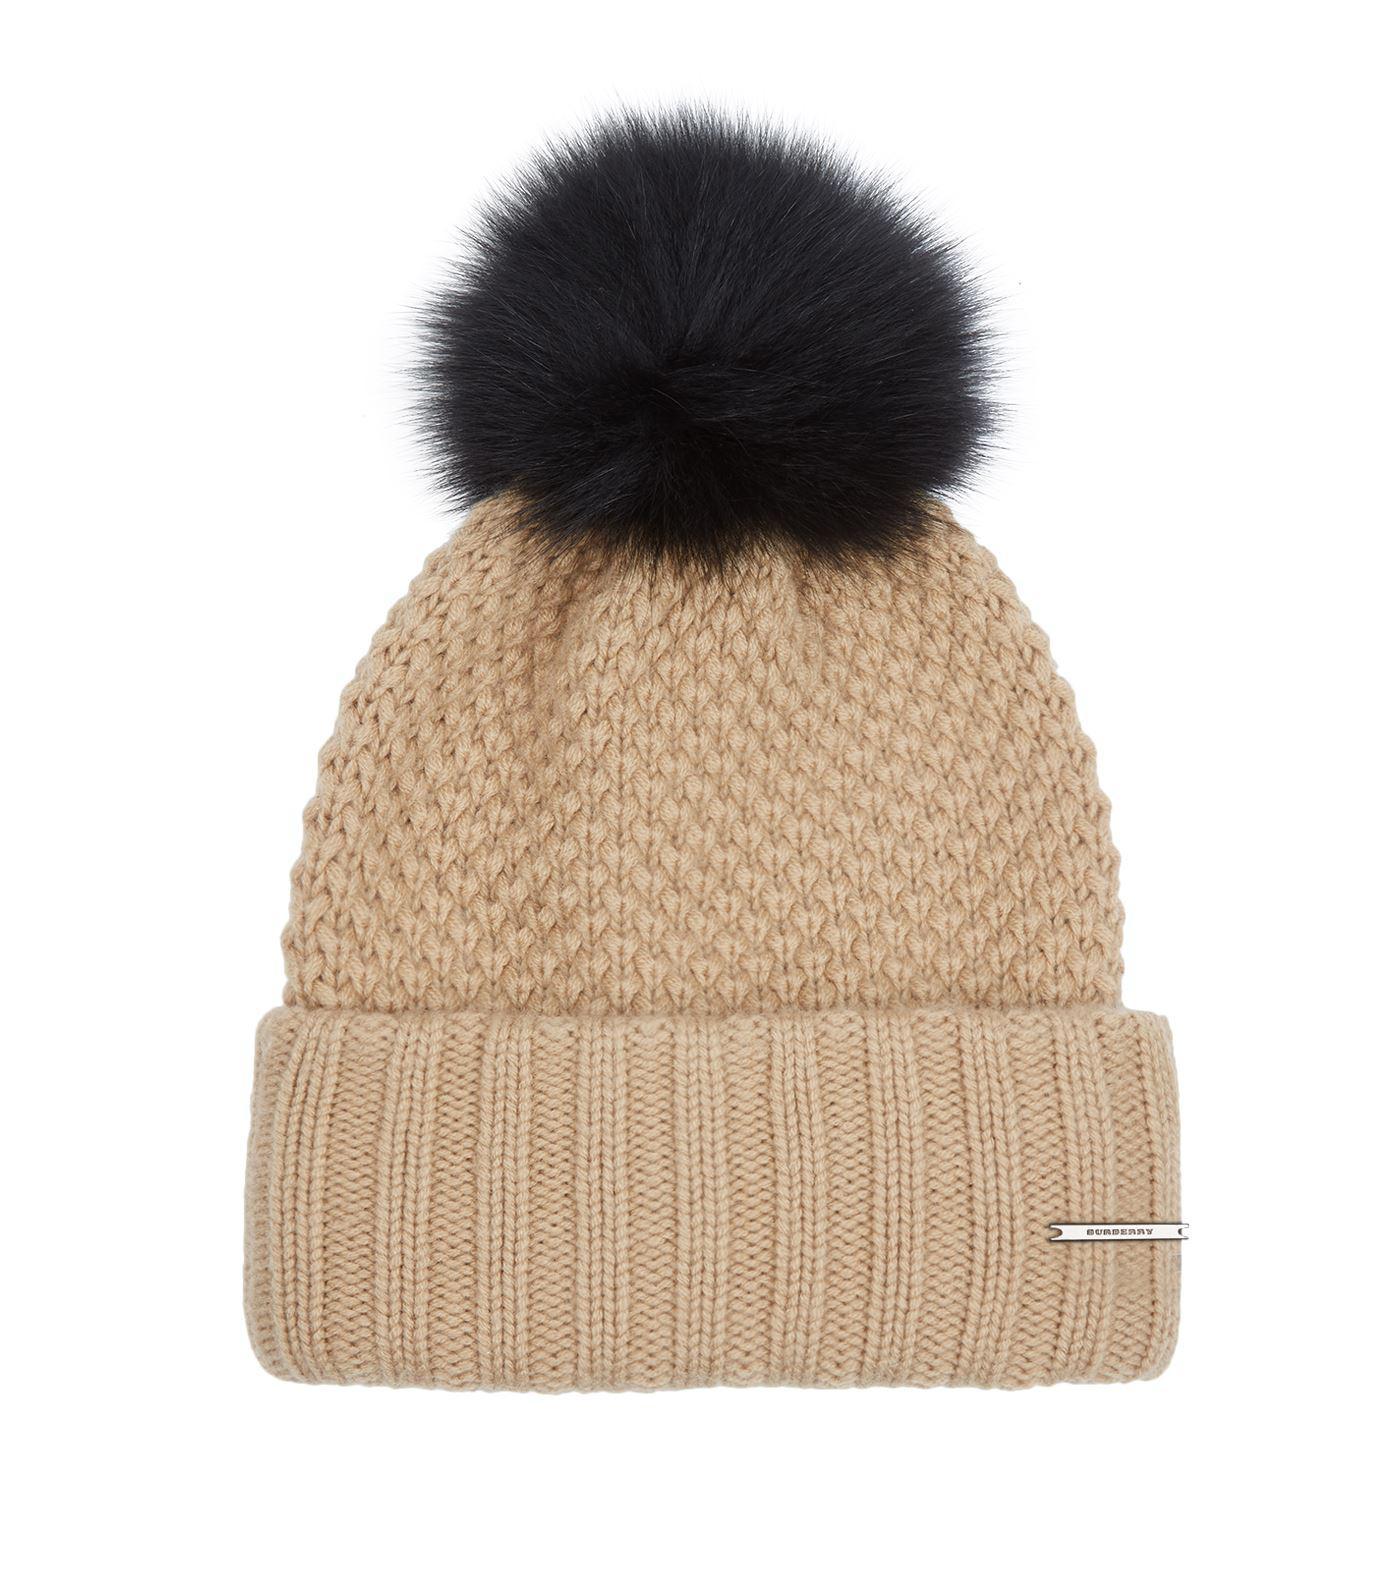 4bd56bf6e16 Lyst - Burberry Fur Pom Pom Wool Cashmere Beanie Hat in Brown